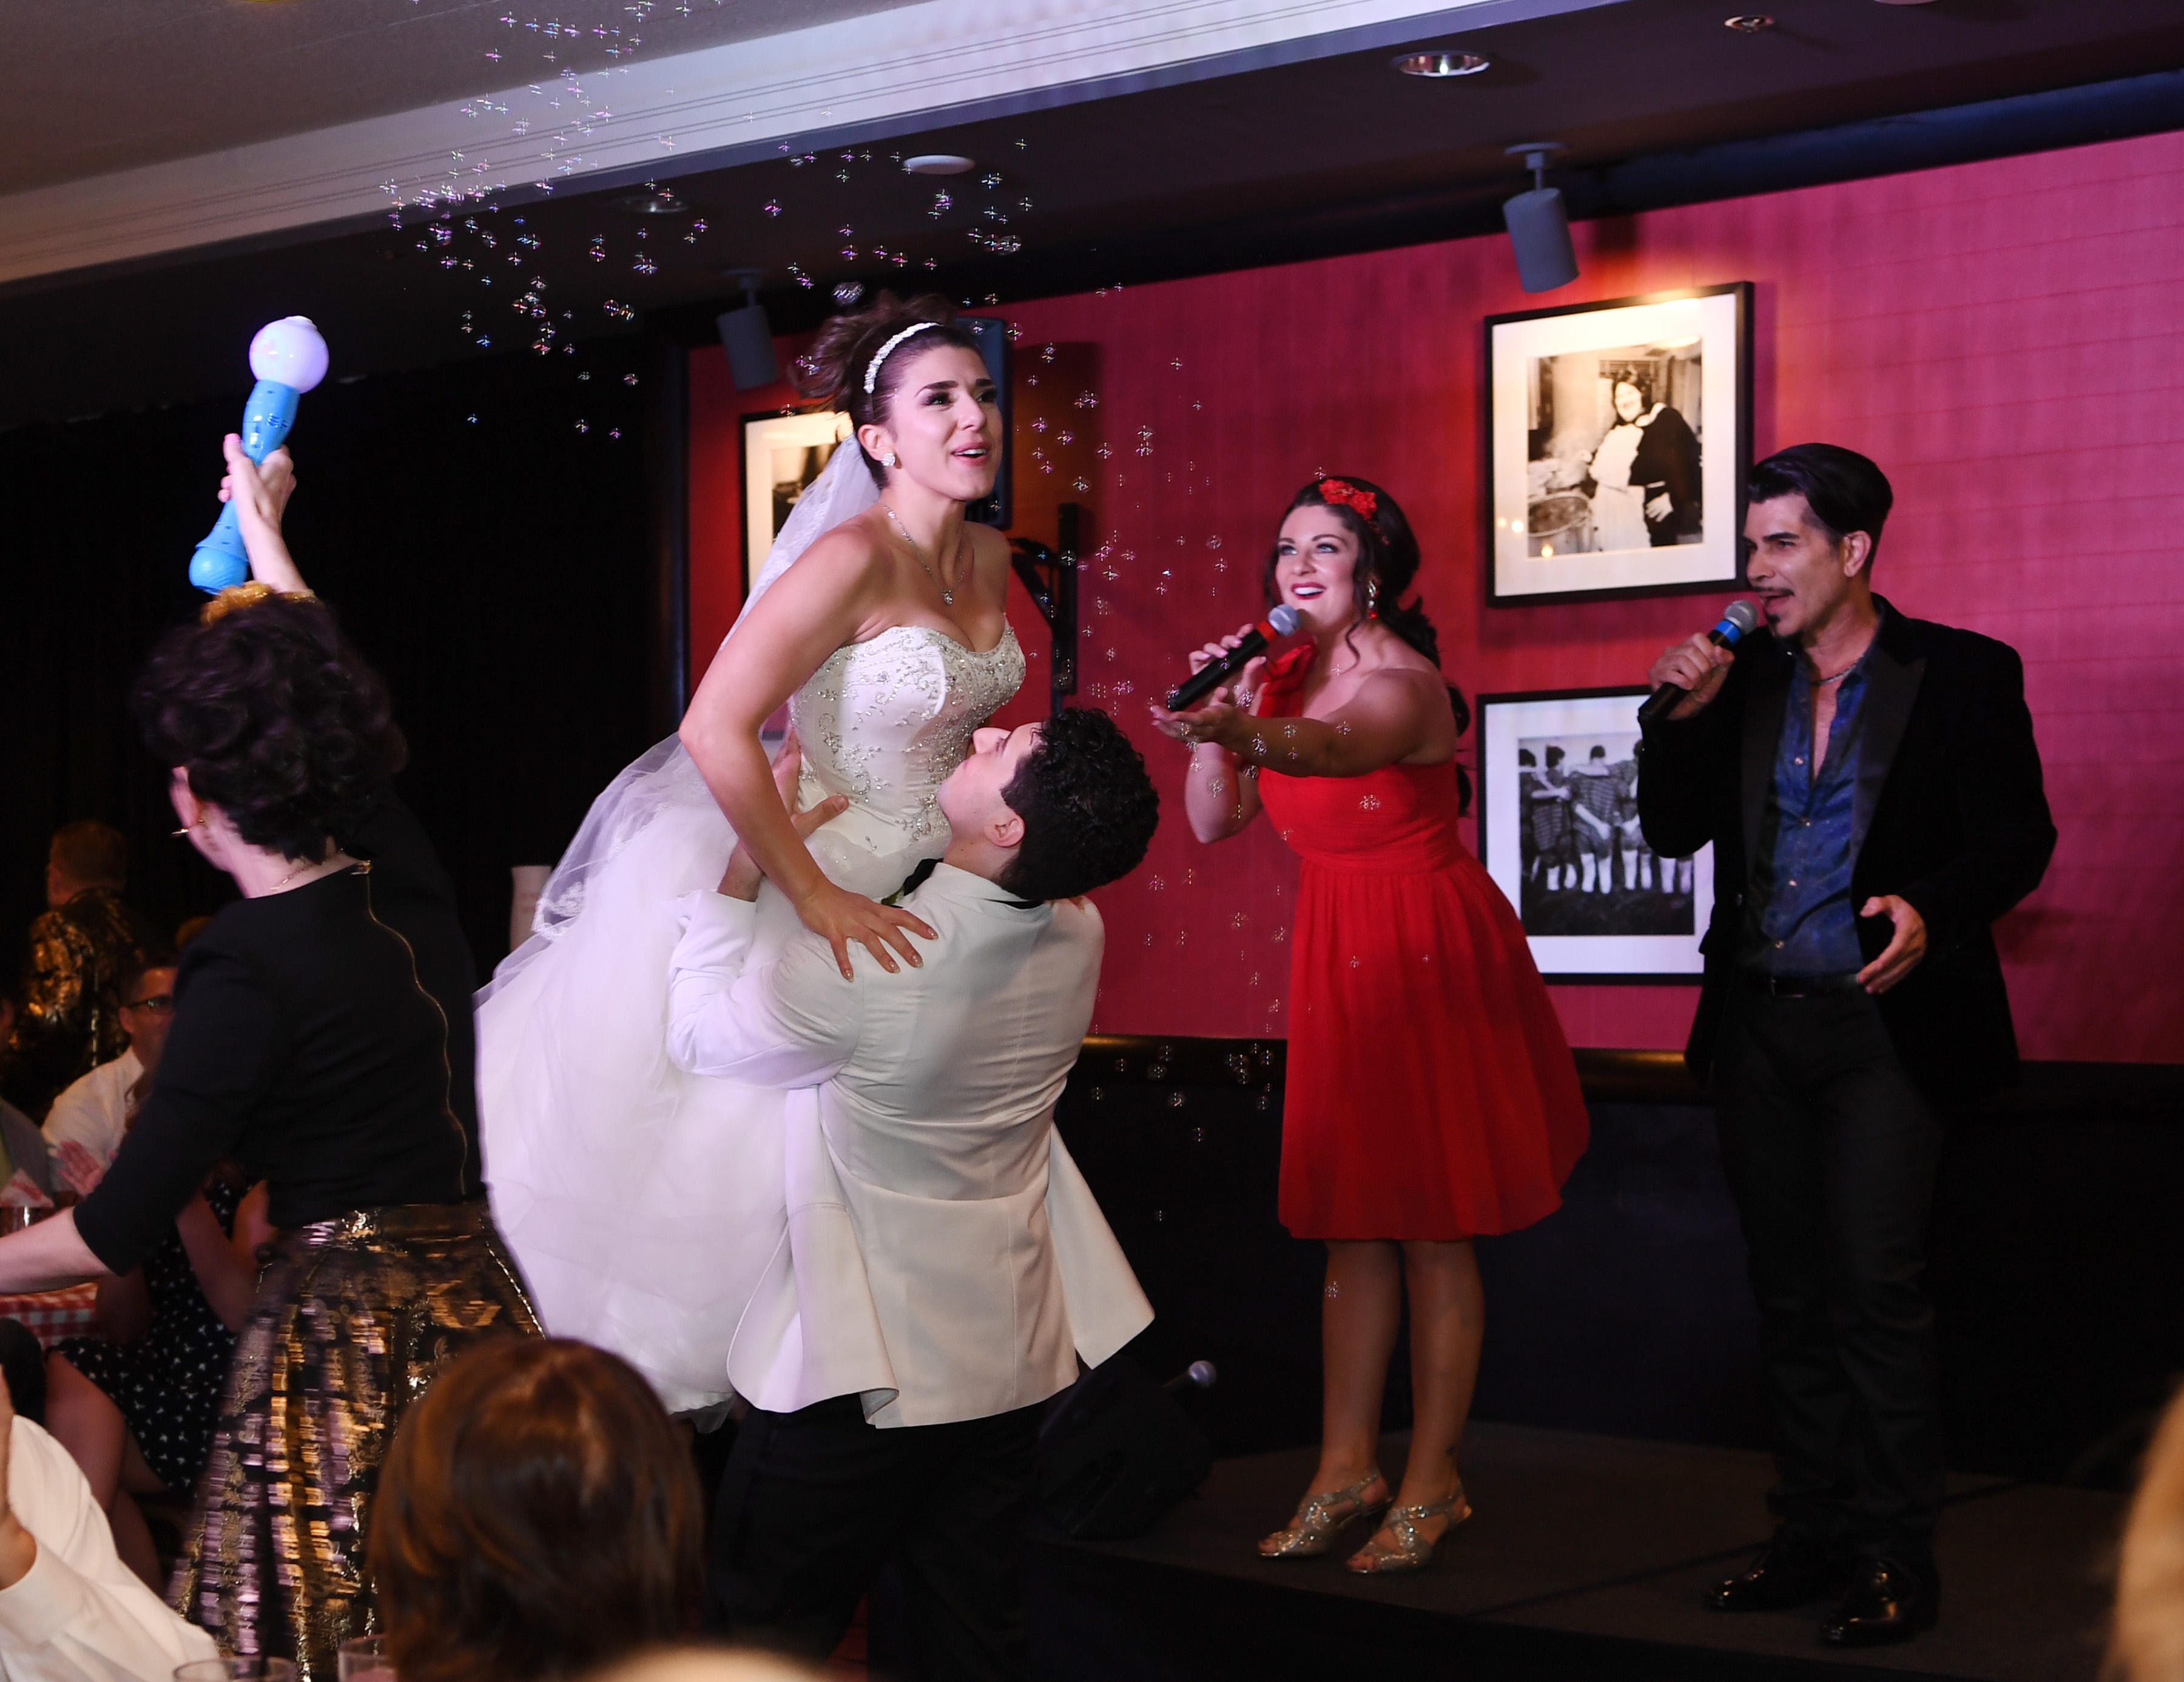 Tony N' Tina's Wedding image 9